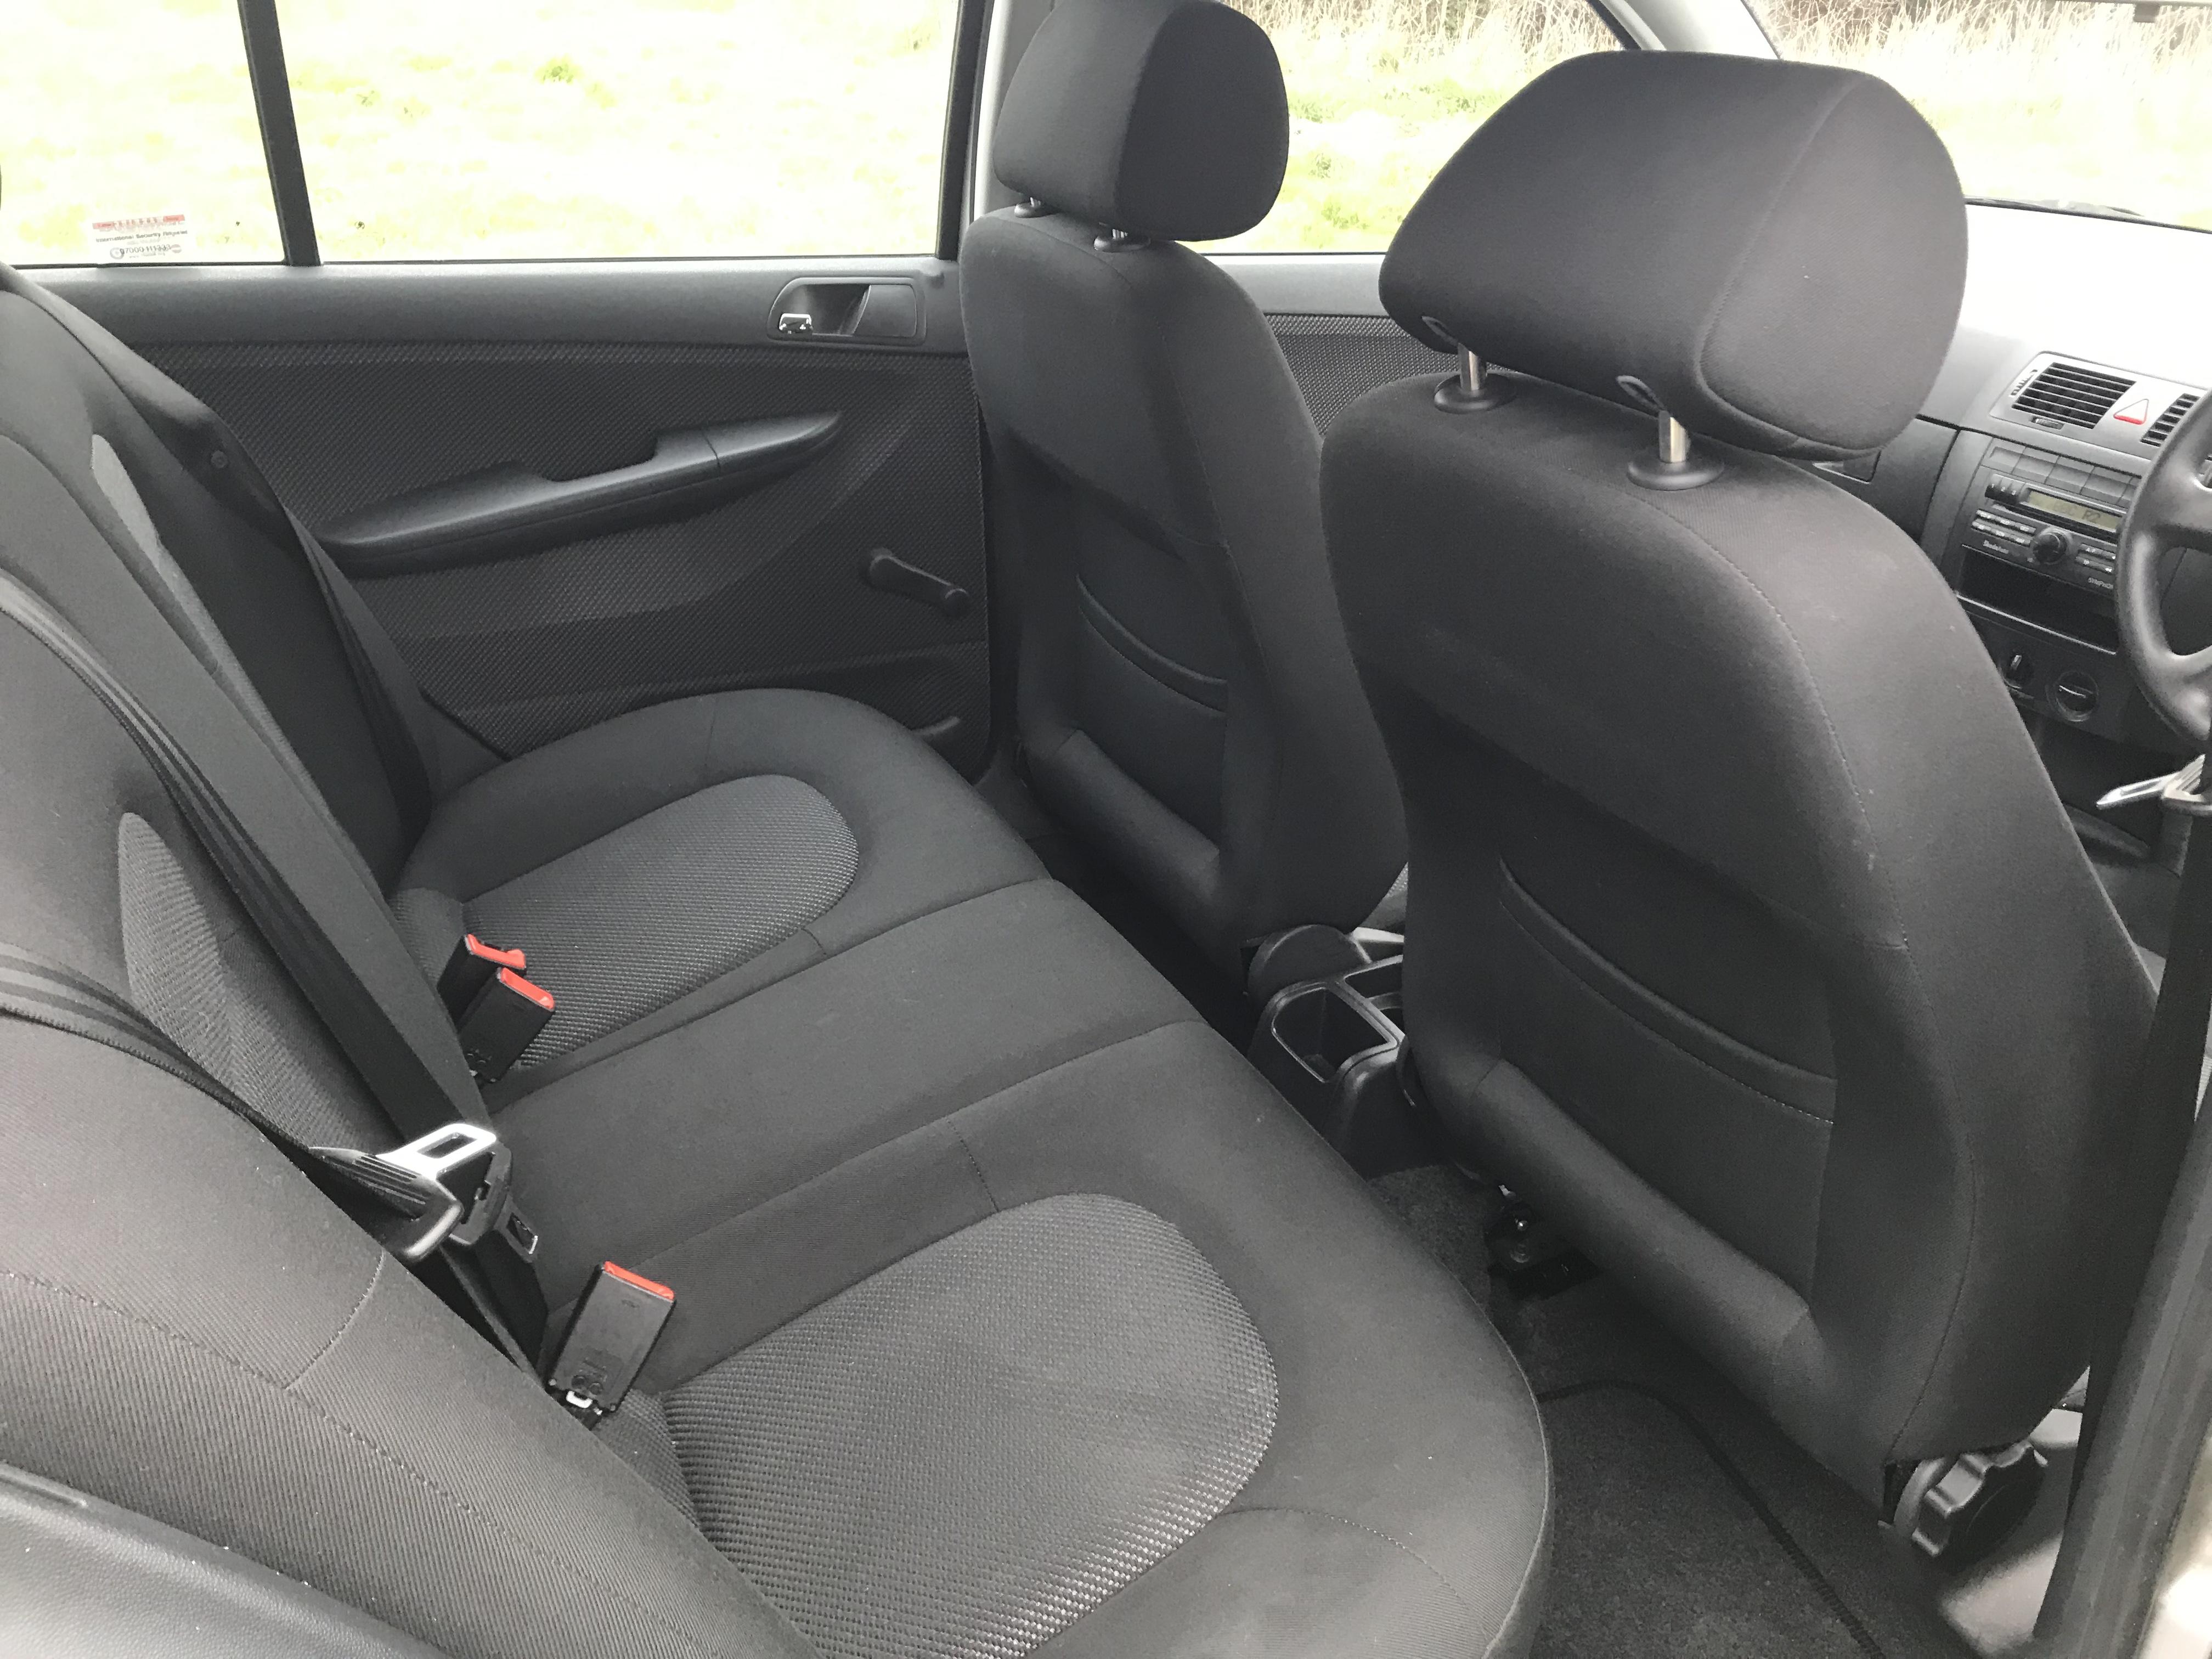 Skoda Fabia 1.4 5 Door Automatic low miles full